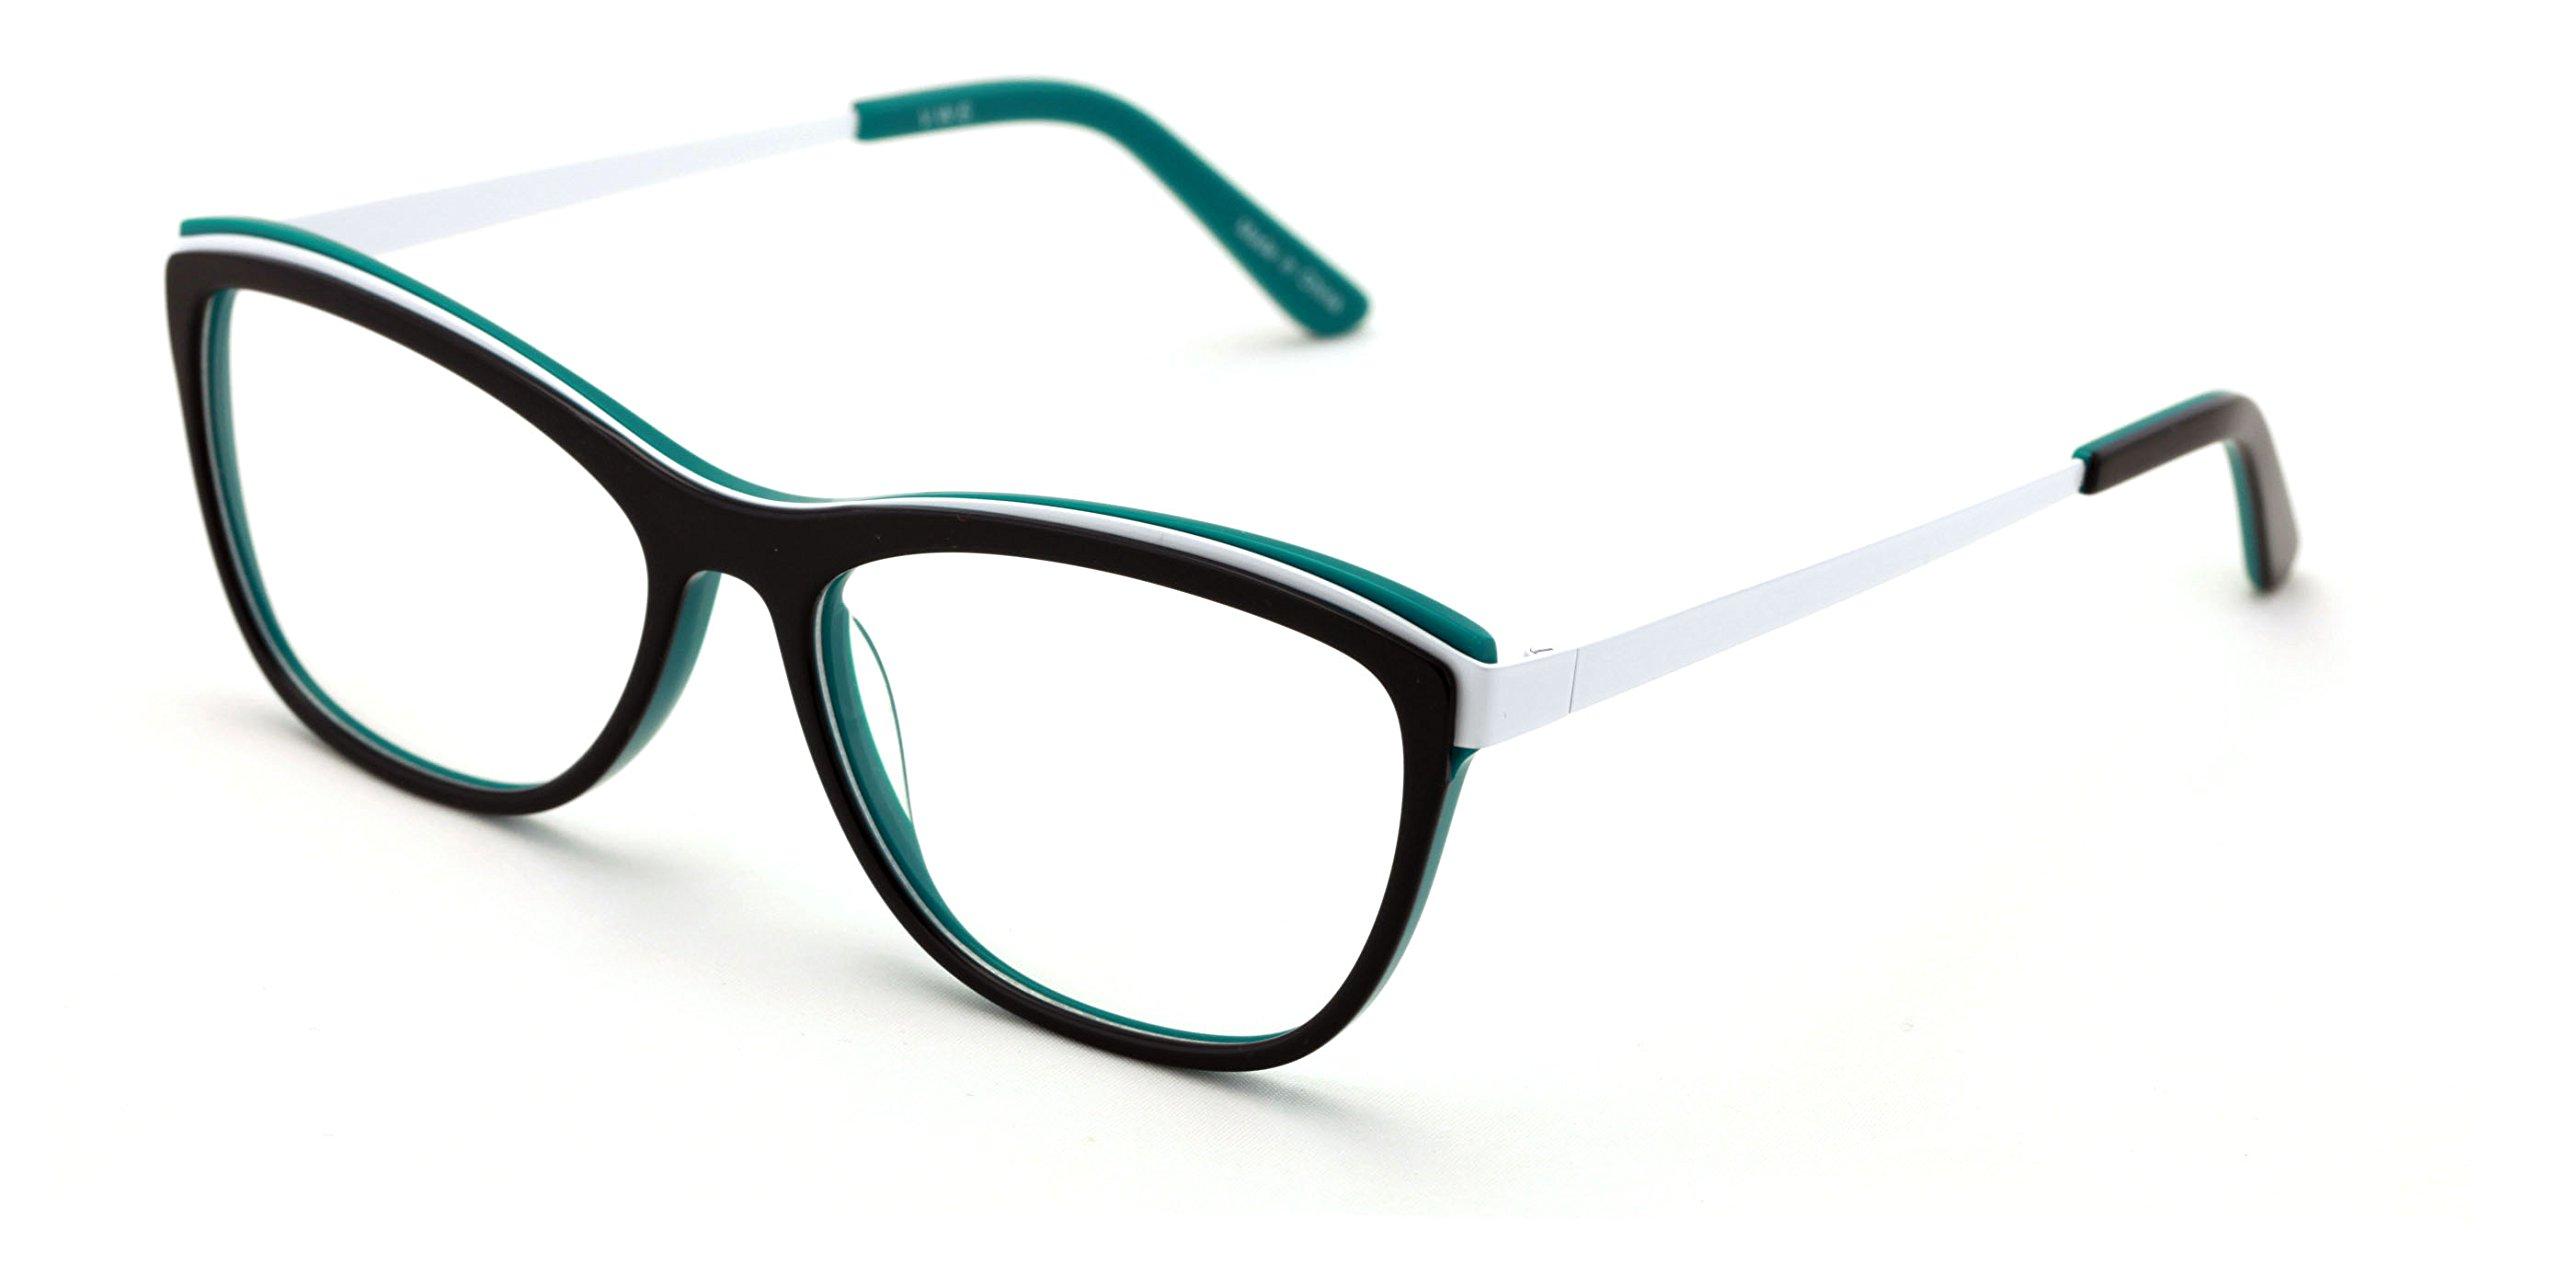 Women 2 Tone Cateye Fashion Non-prescription Acetate Glasses Frame /w Metal Temple - Clear Lens Eyeglasses Rx'able (Teal)